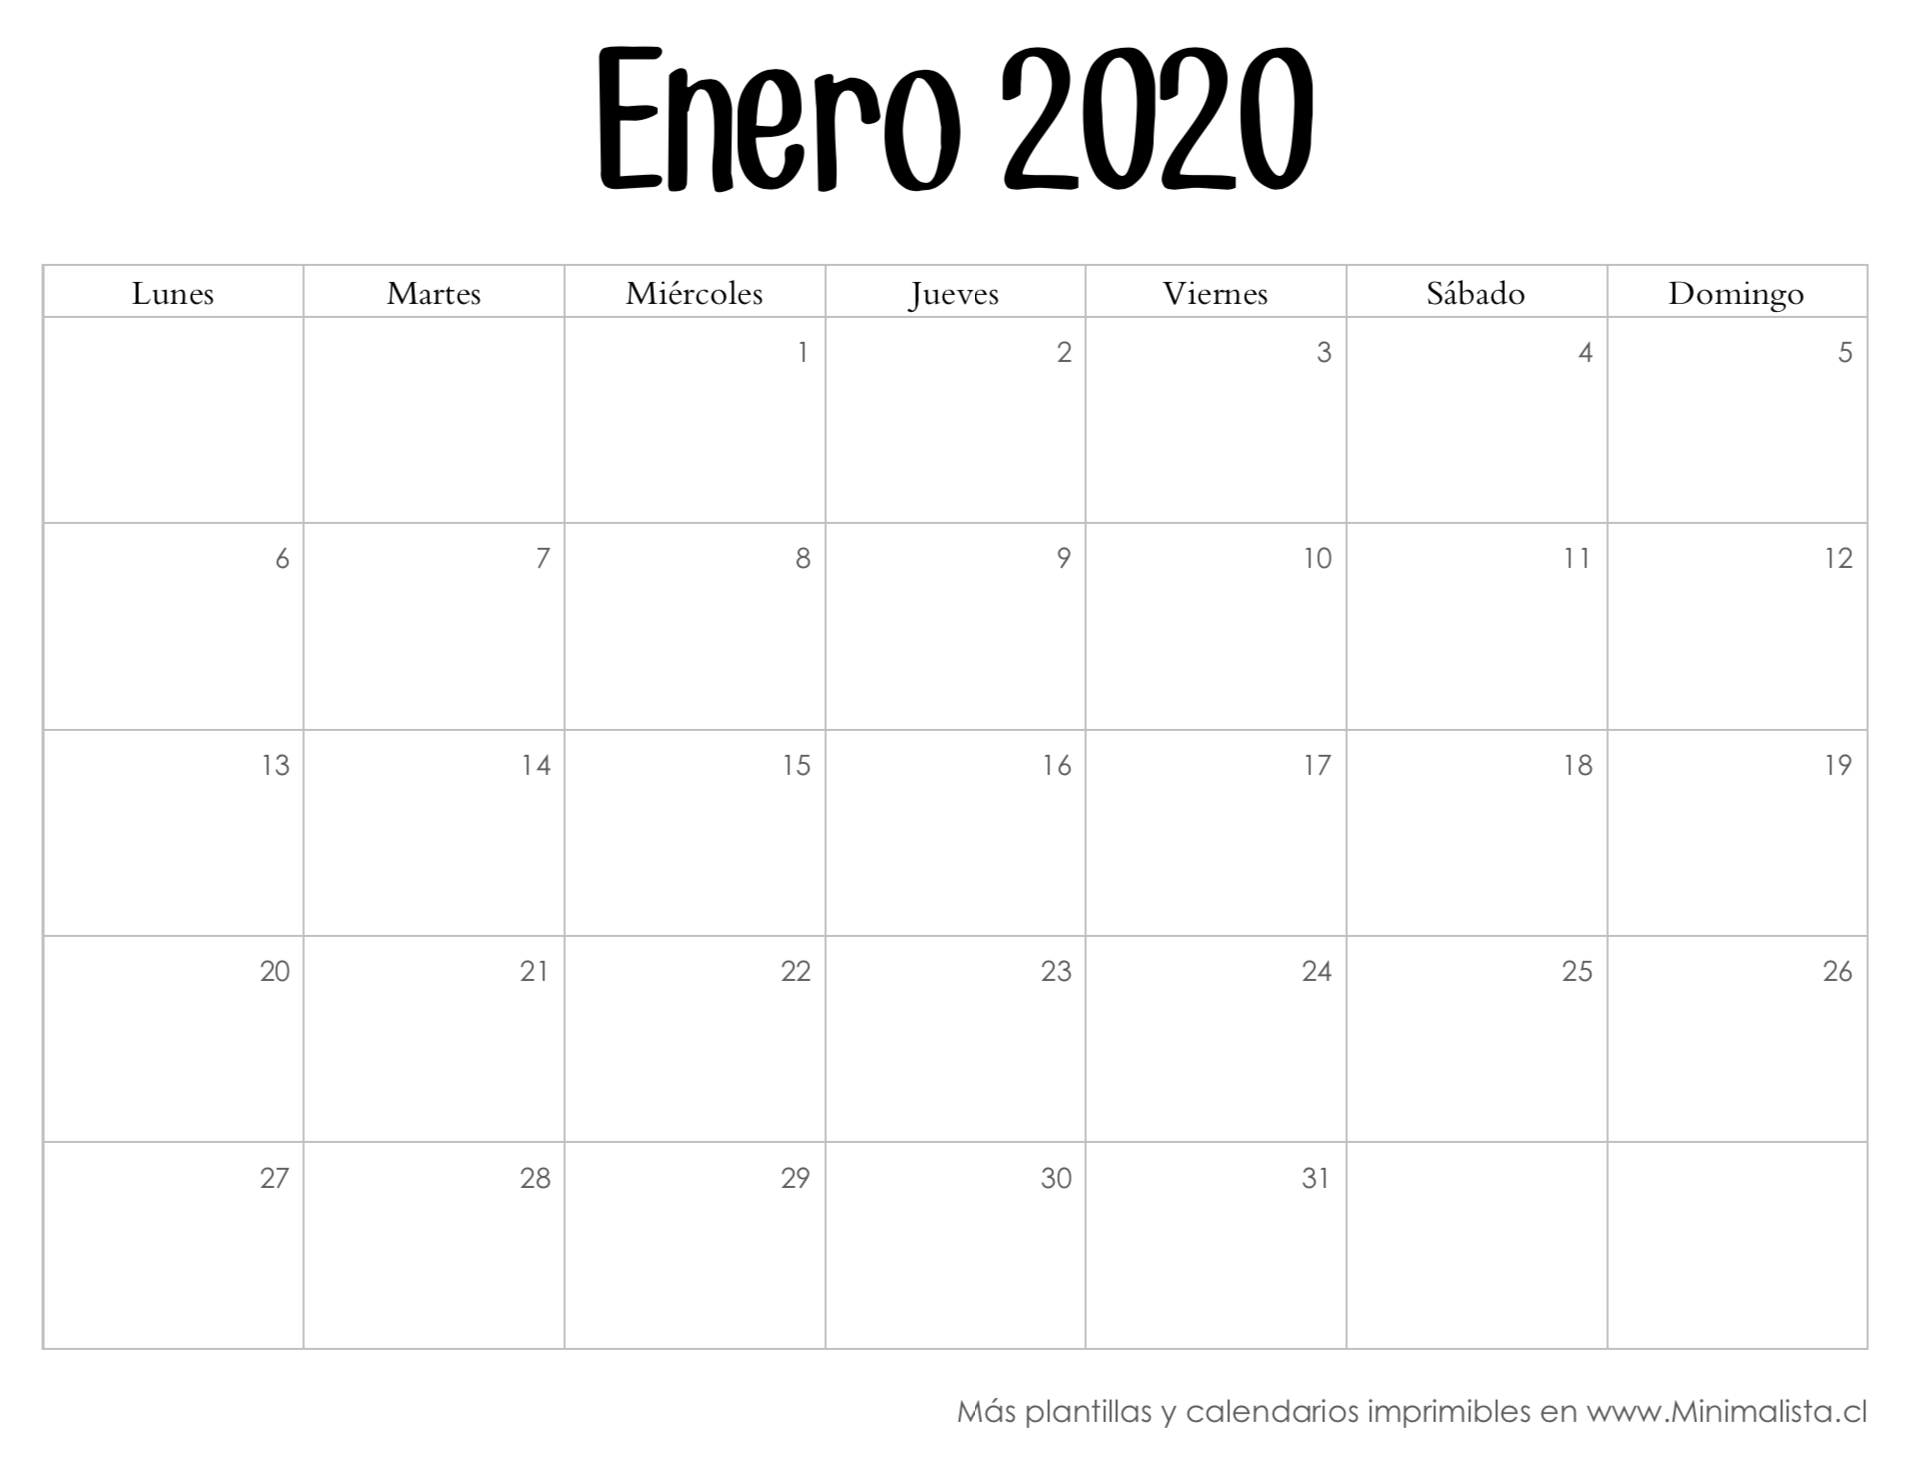 Calendarios 2020 Para Imprmir | Calendarios Mensuales  Calendario 2020 Mensual Para Imprimir Gratis Febrero